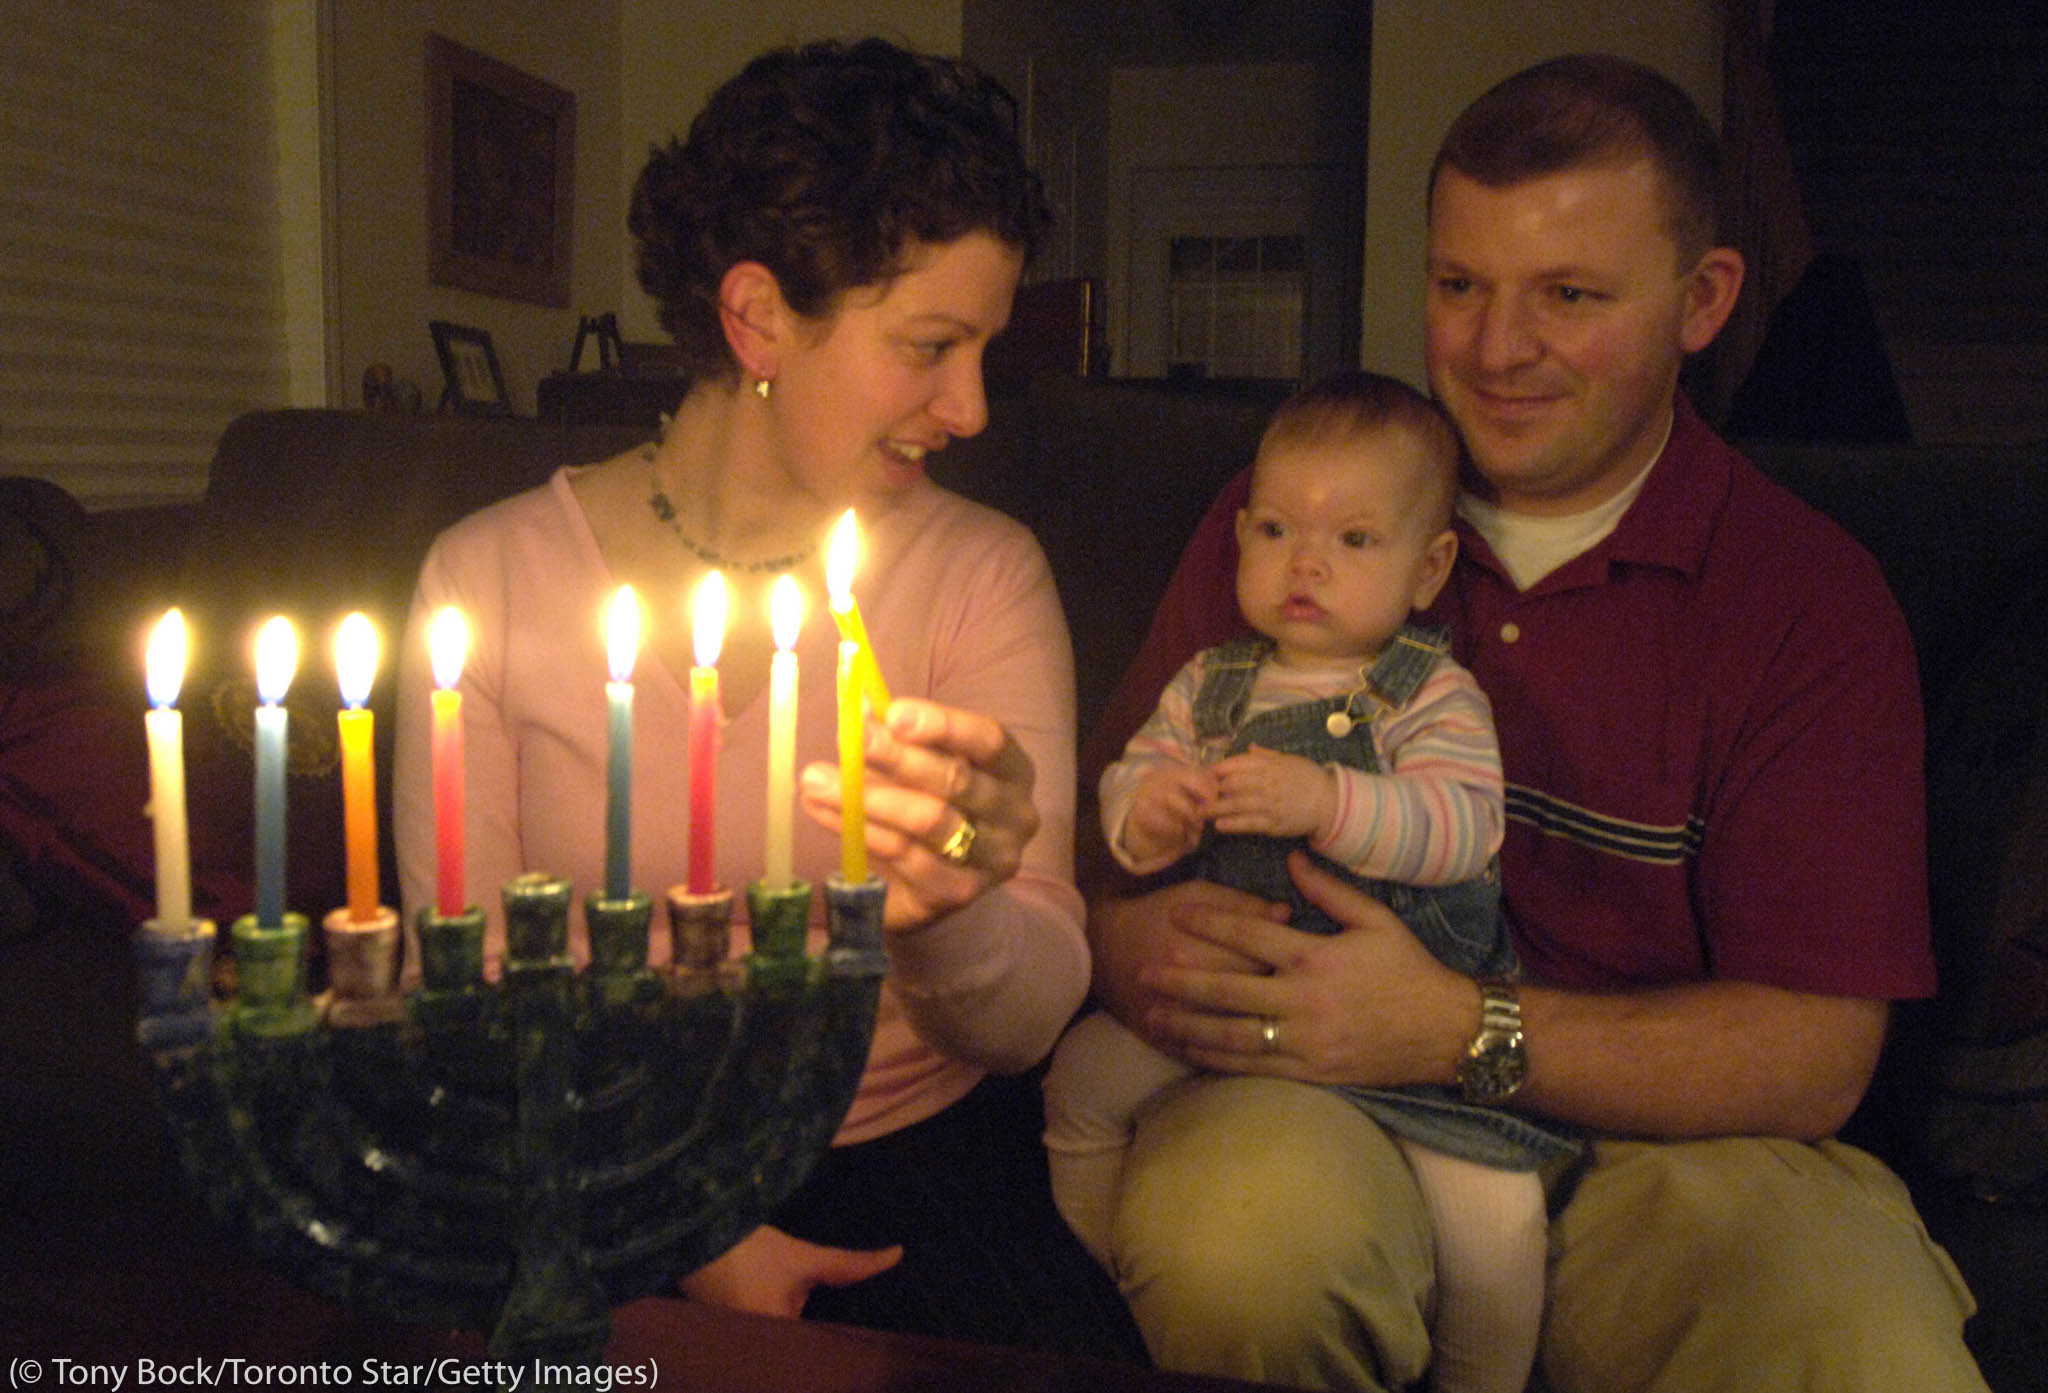 Parents with child on lap lighting menorah (Tony Bock/Toronto Star/Getty Images)